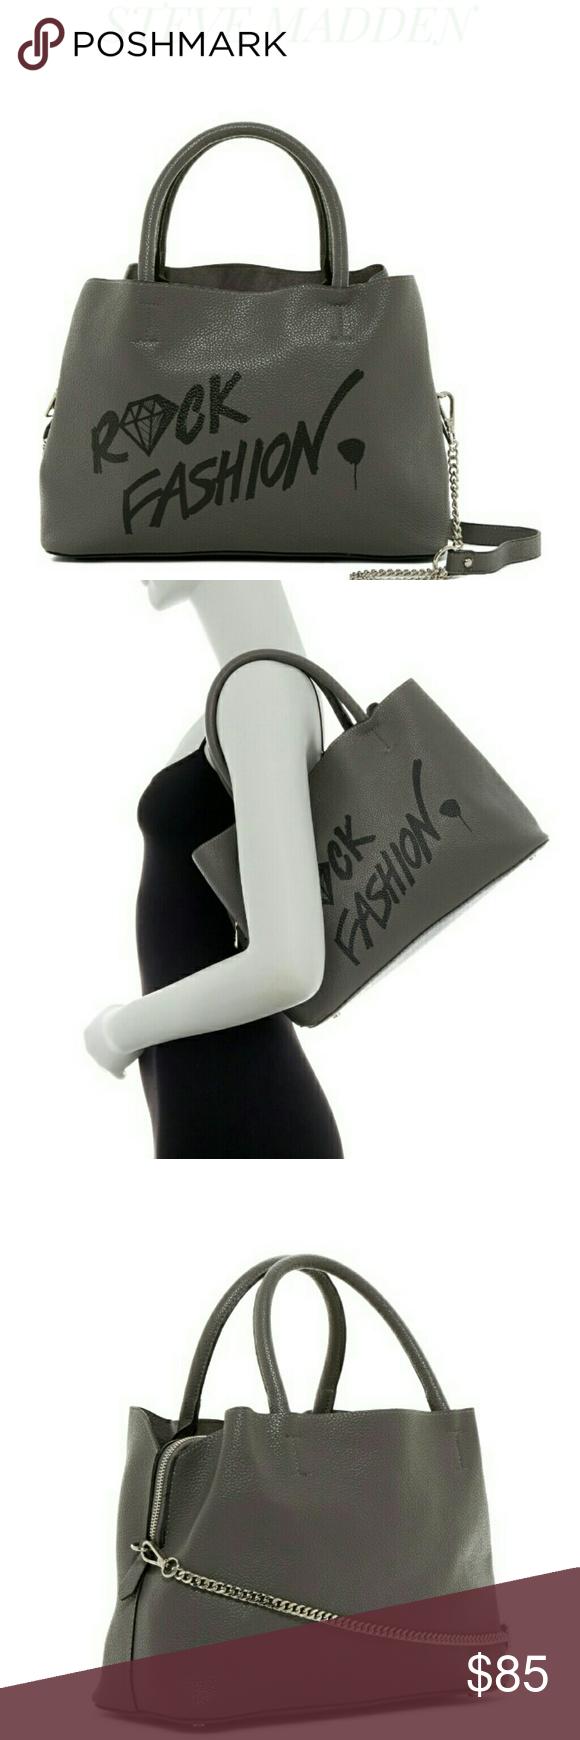 3ccac56dd21 STEVE MADDEN BAG New Brand new still in package